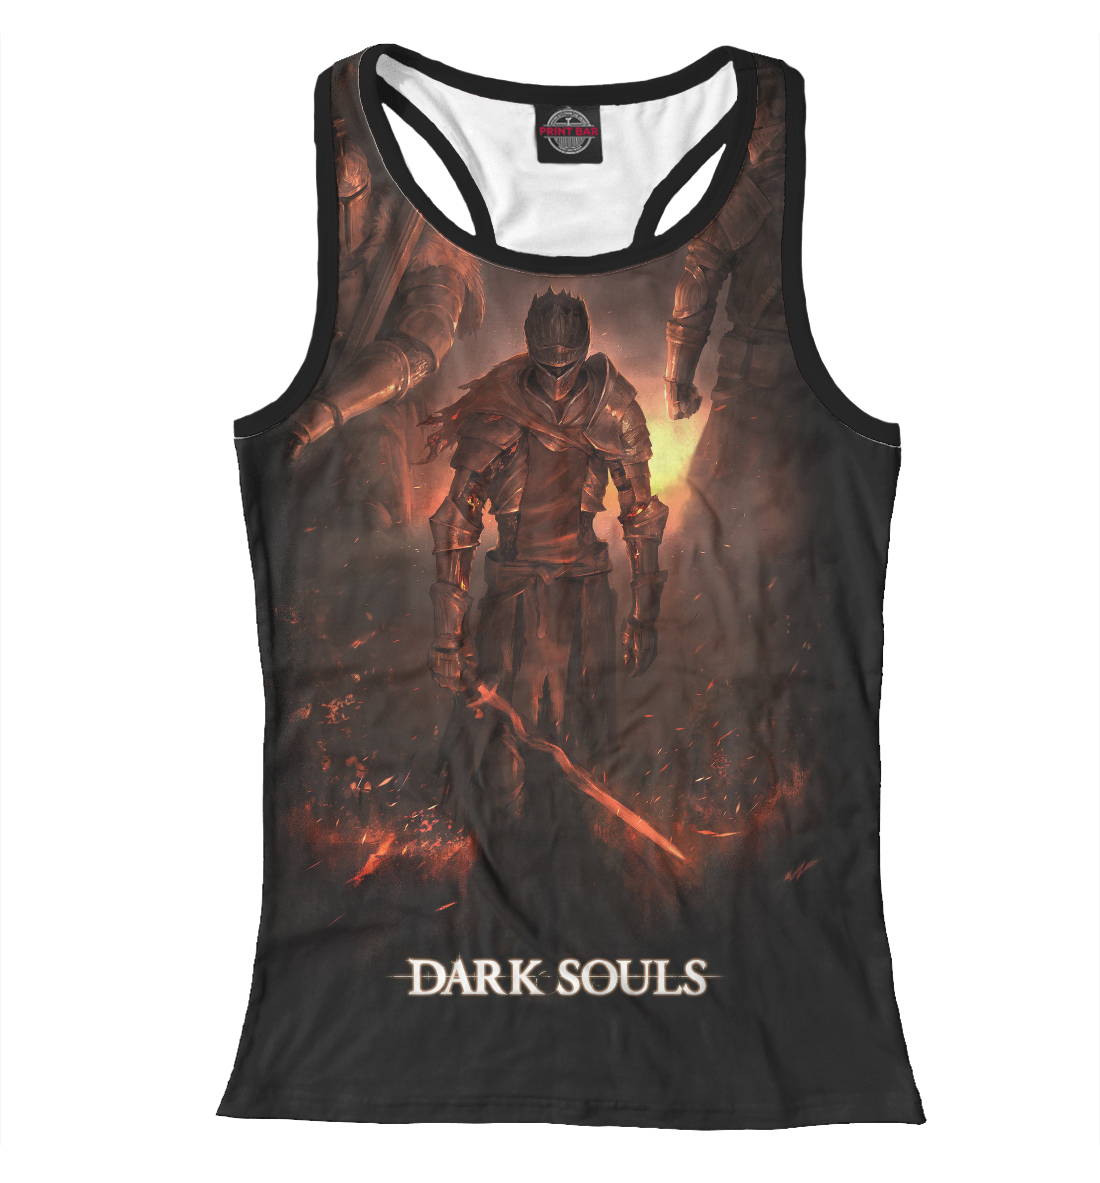 Dark Souls, Printbar, Майки борцовки, DKS-514078-mayb-1  - купить со скидкой